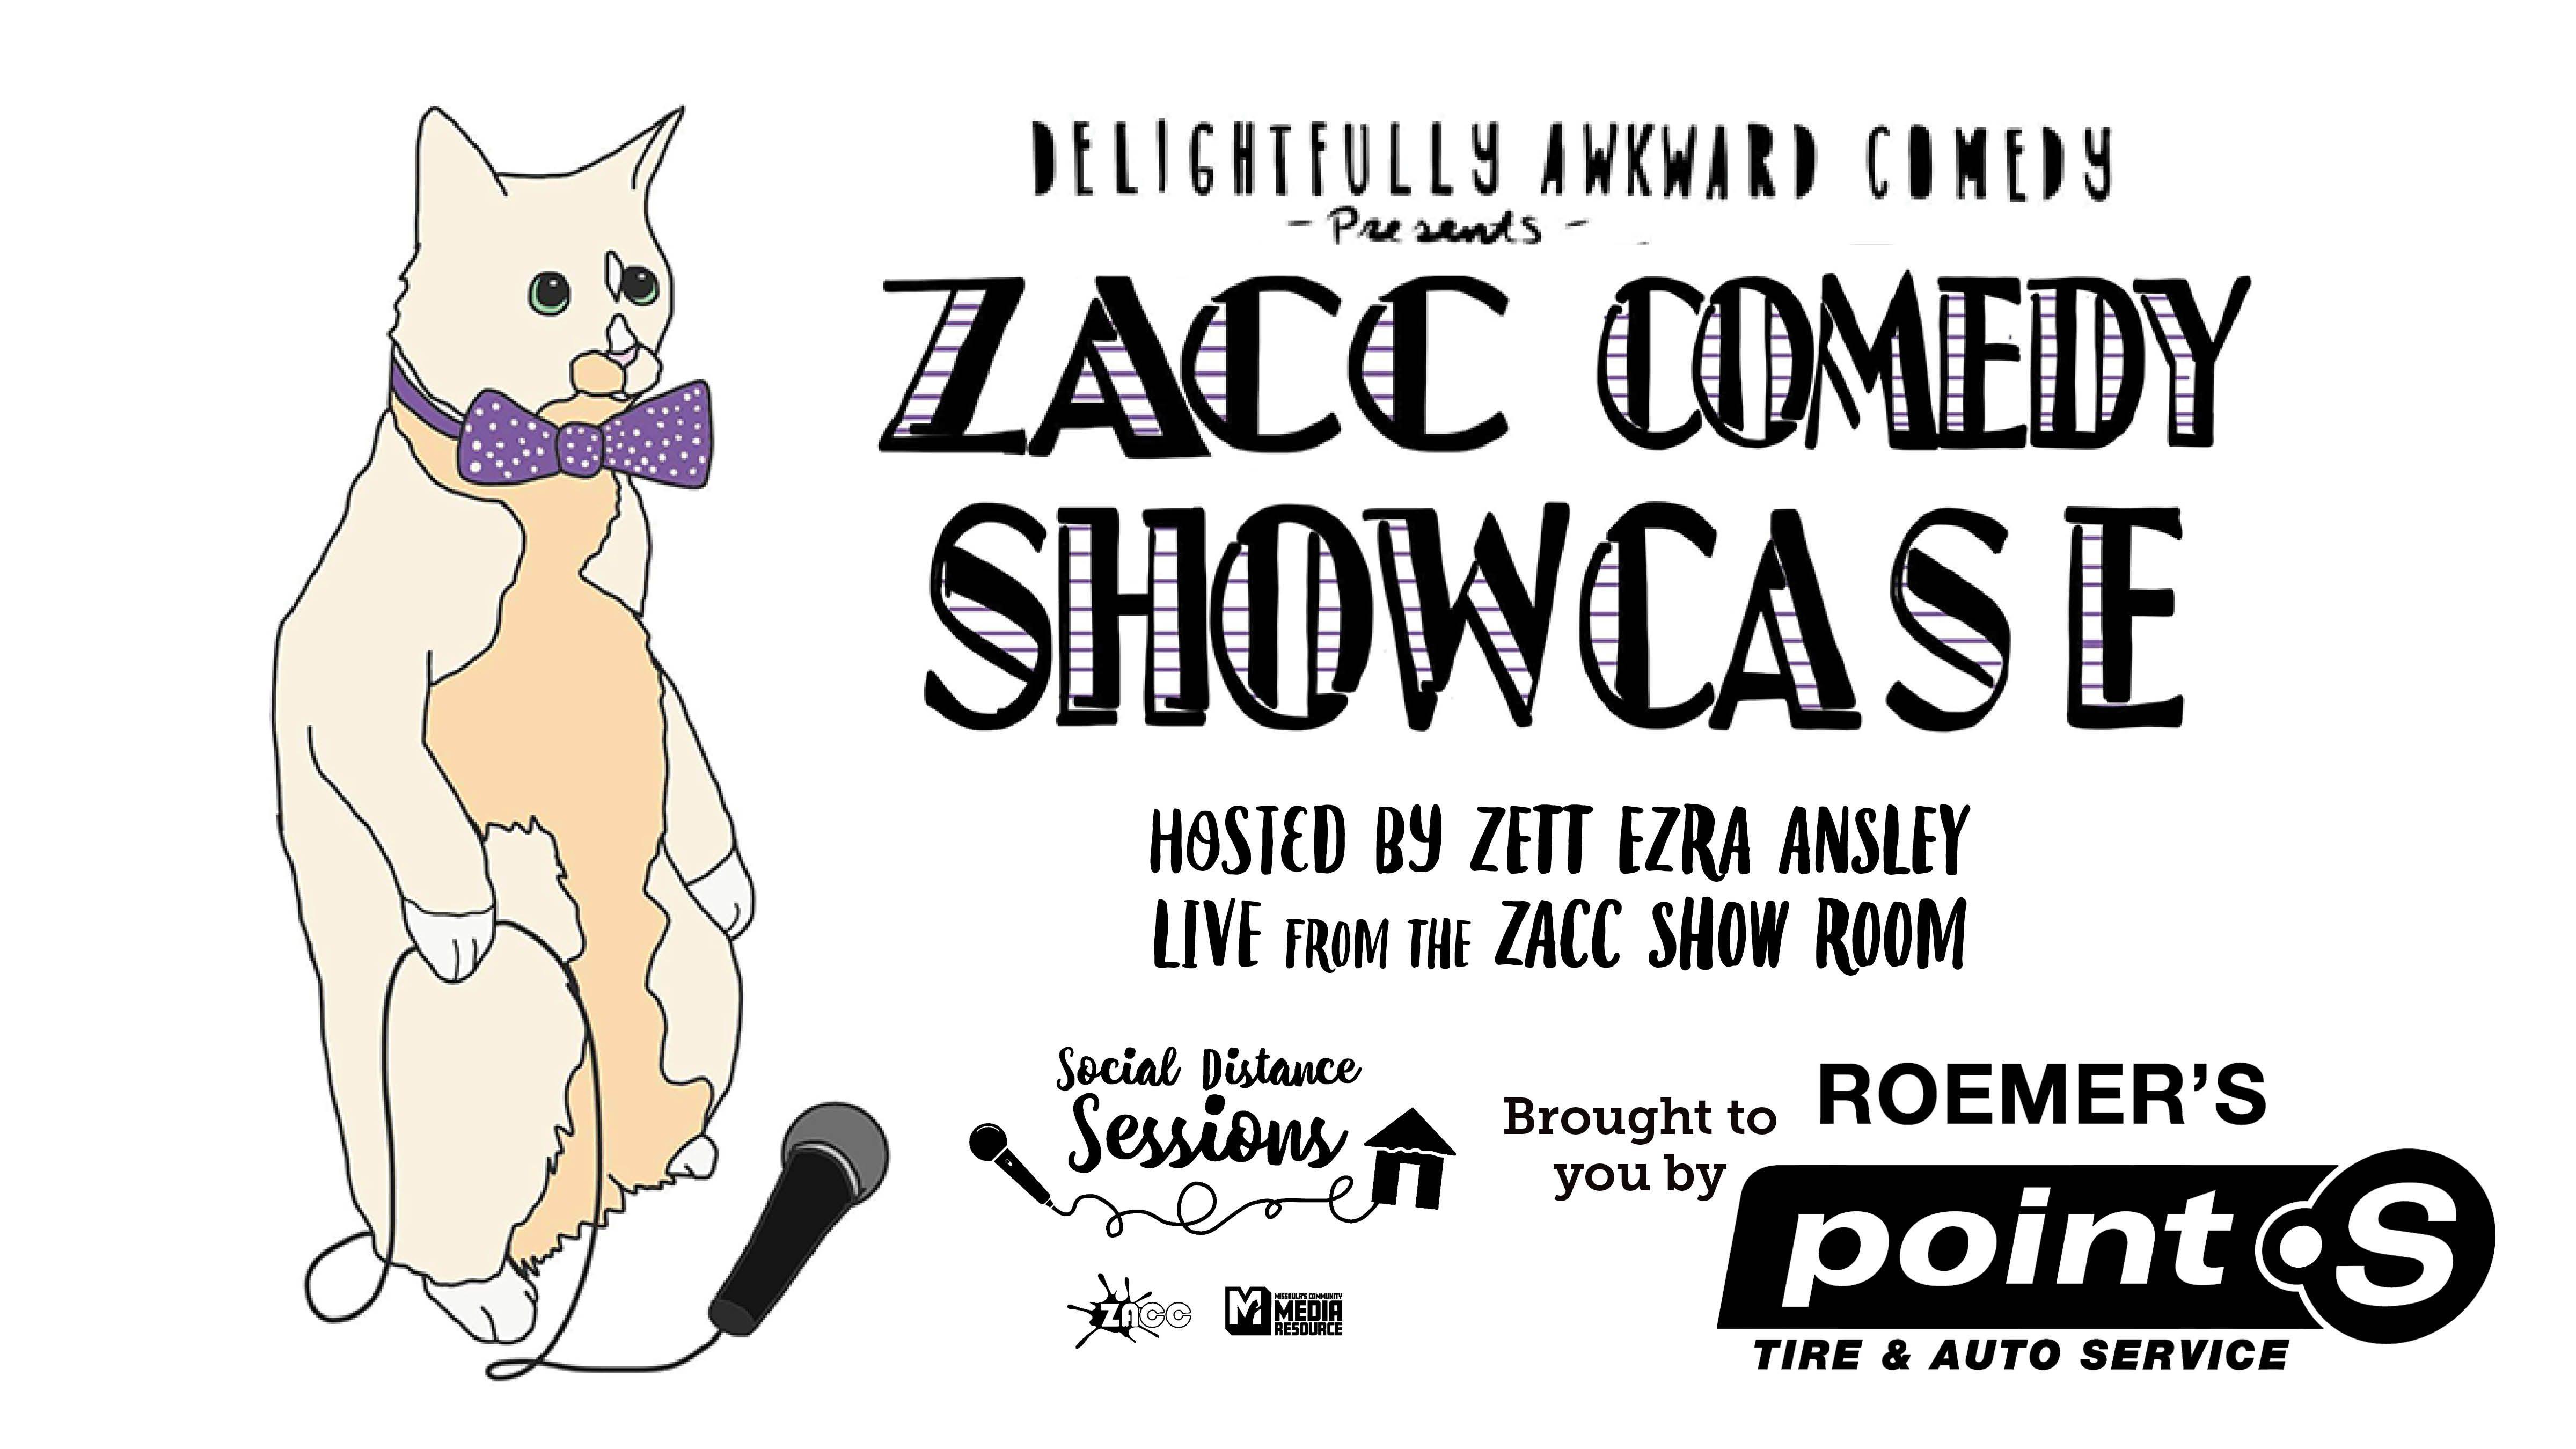 Social Distance Sessions: ZACC Comedy Showcase